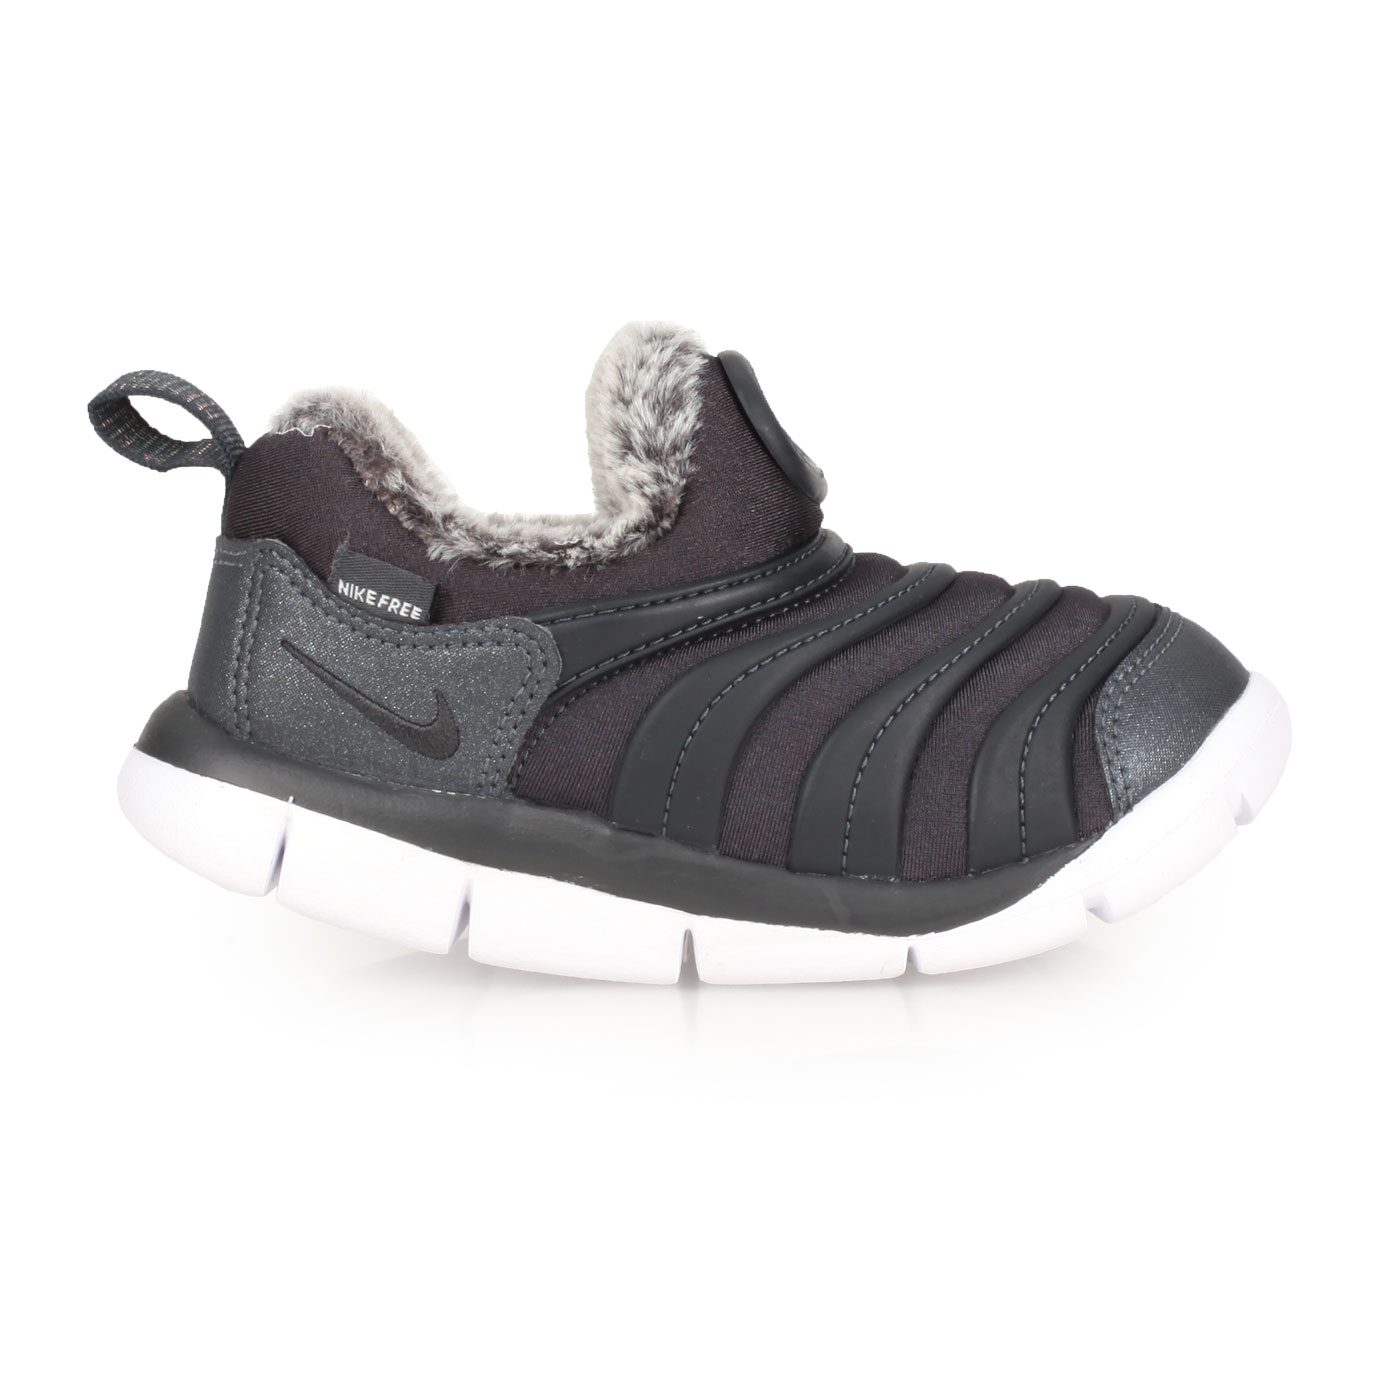 NIKE 小童毛毛蟲保暖運動鞋  @DYNAMO FREE SE (TD)@AA7217002 - 黑灰白